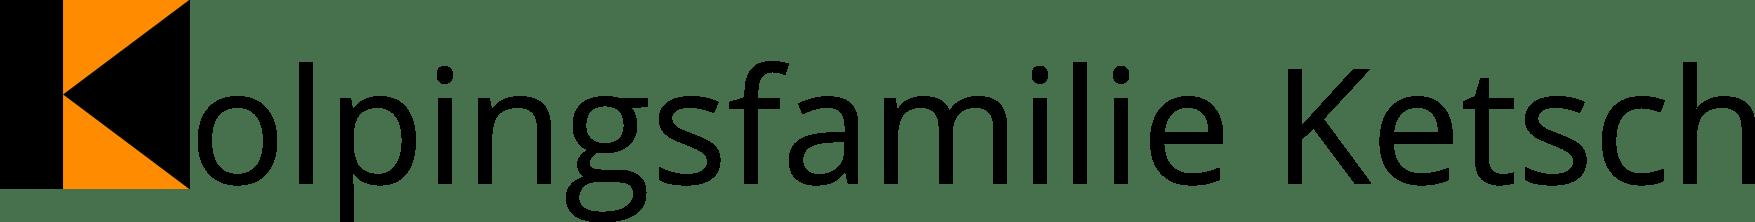 Homepage der Kolpingsfamilie Ketsch